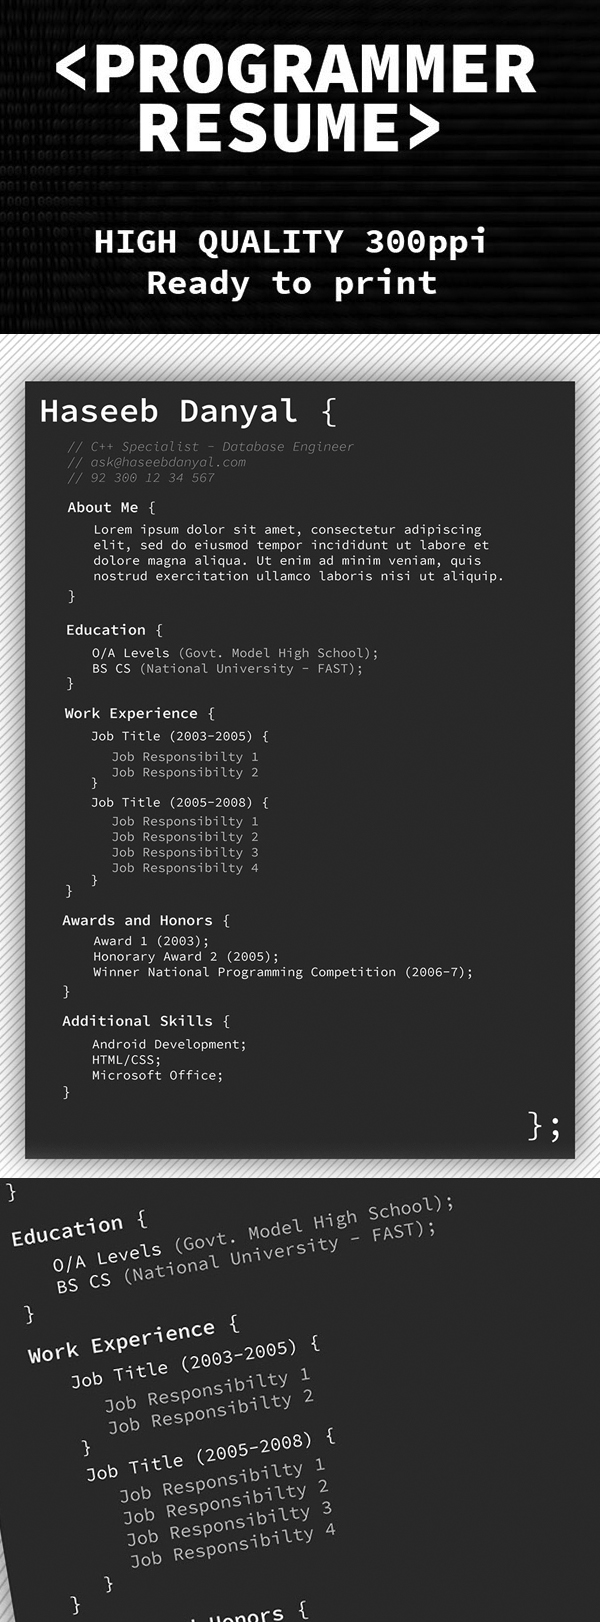 programmer resume psd template